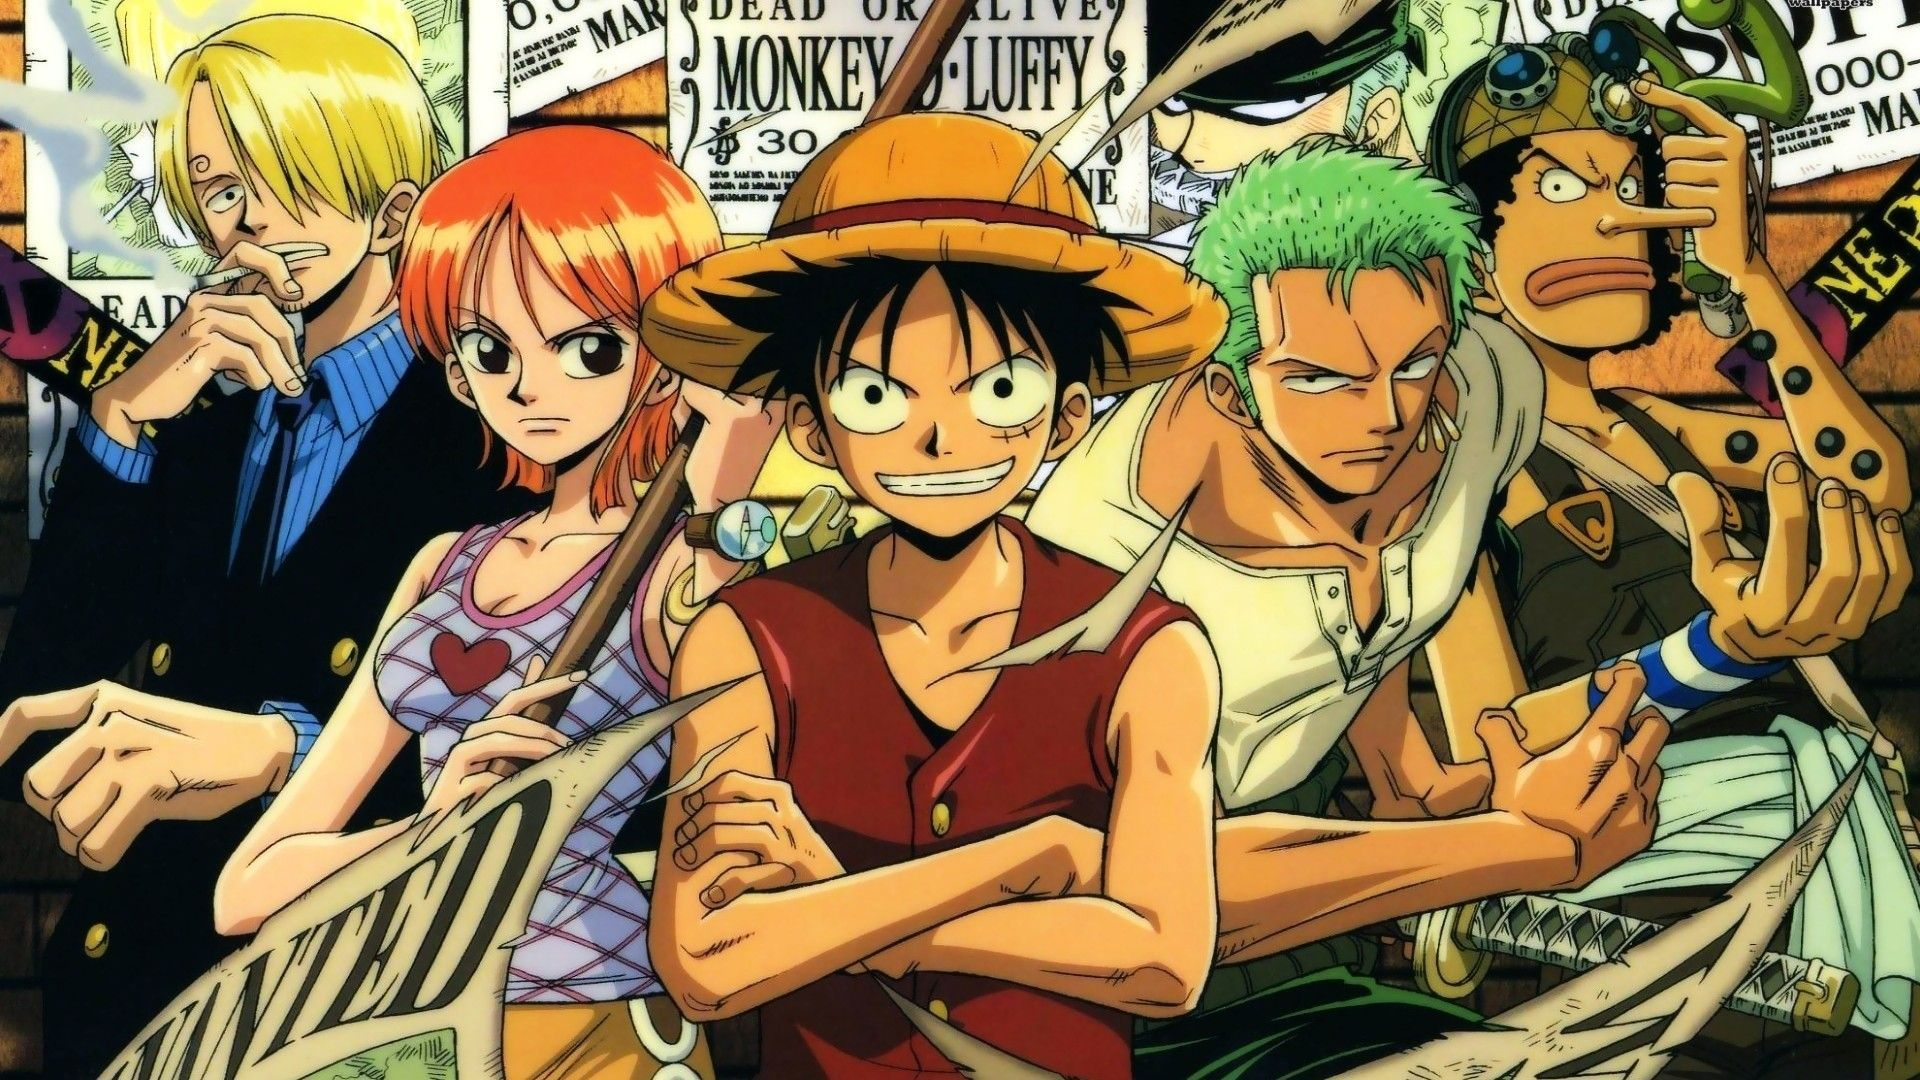 Google themes anime one piece - Explore One Piece Nami One Piece Manga And More